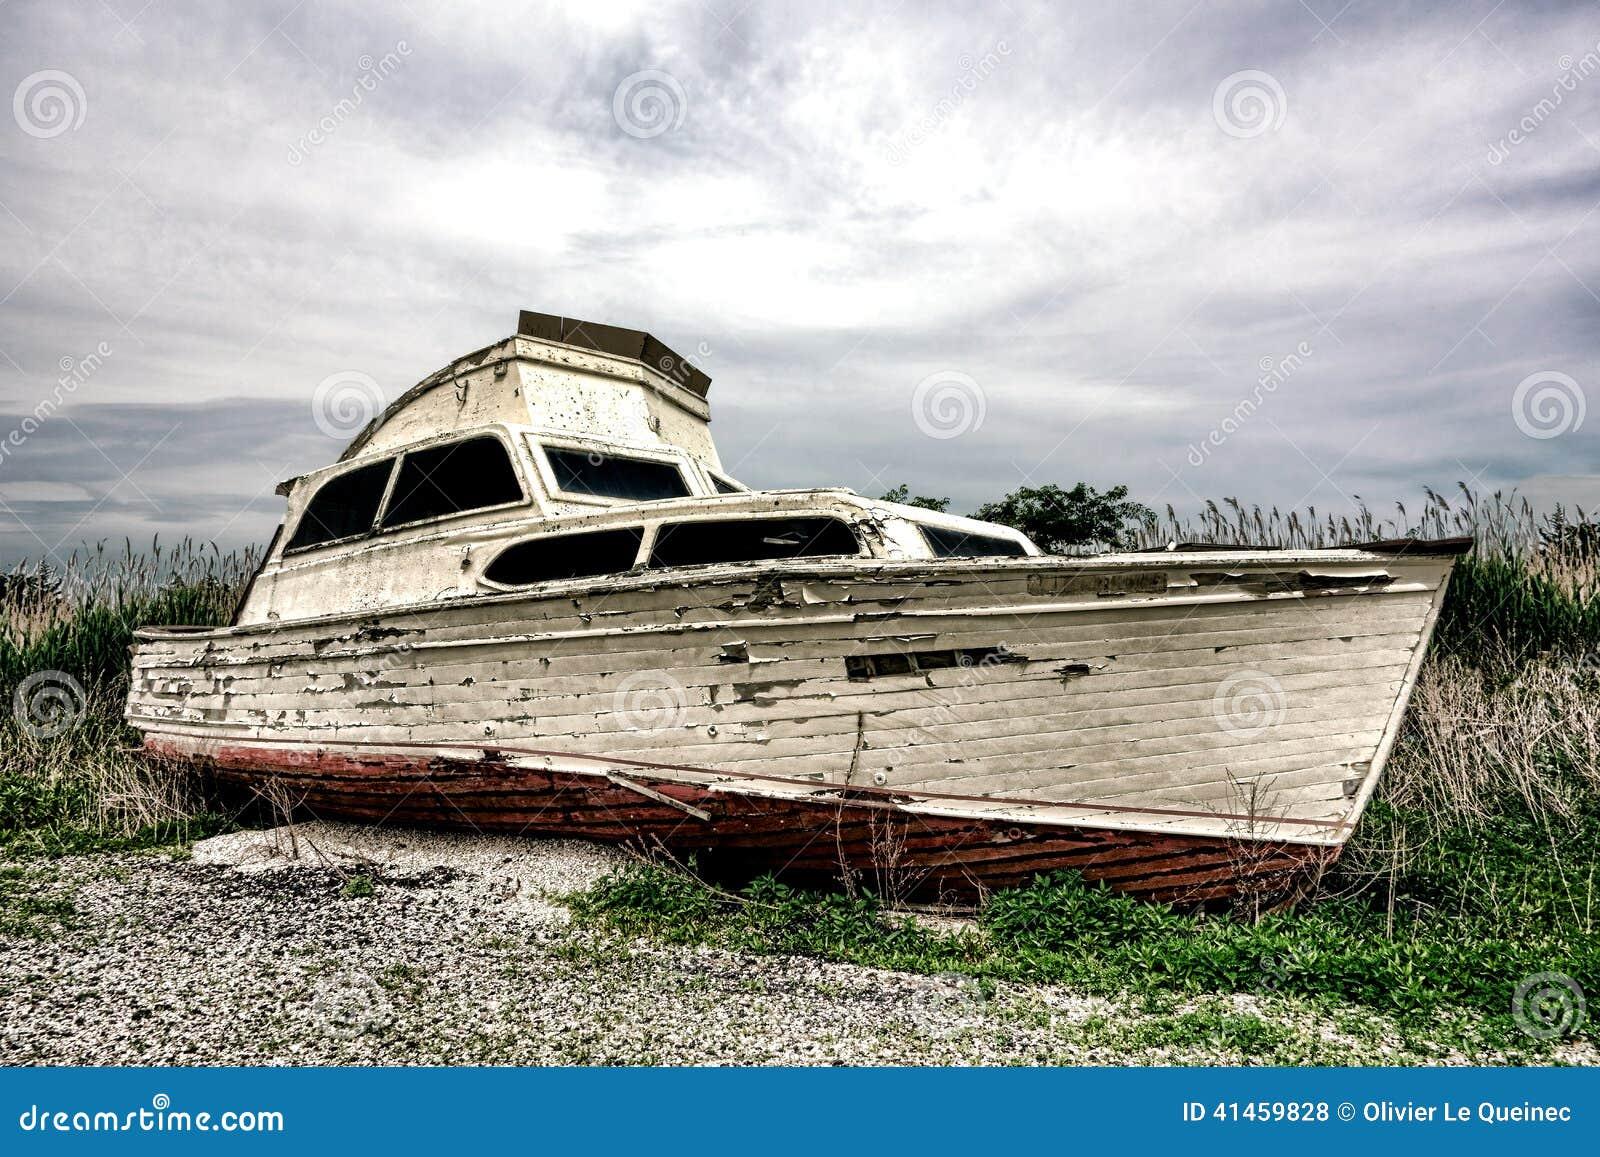 Old Abandoned Pleasure Recreational Boat On Land Stock ...